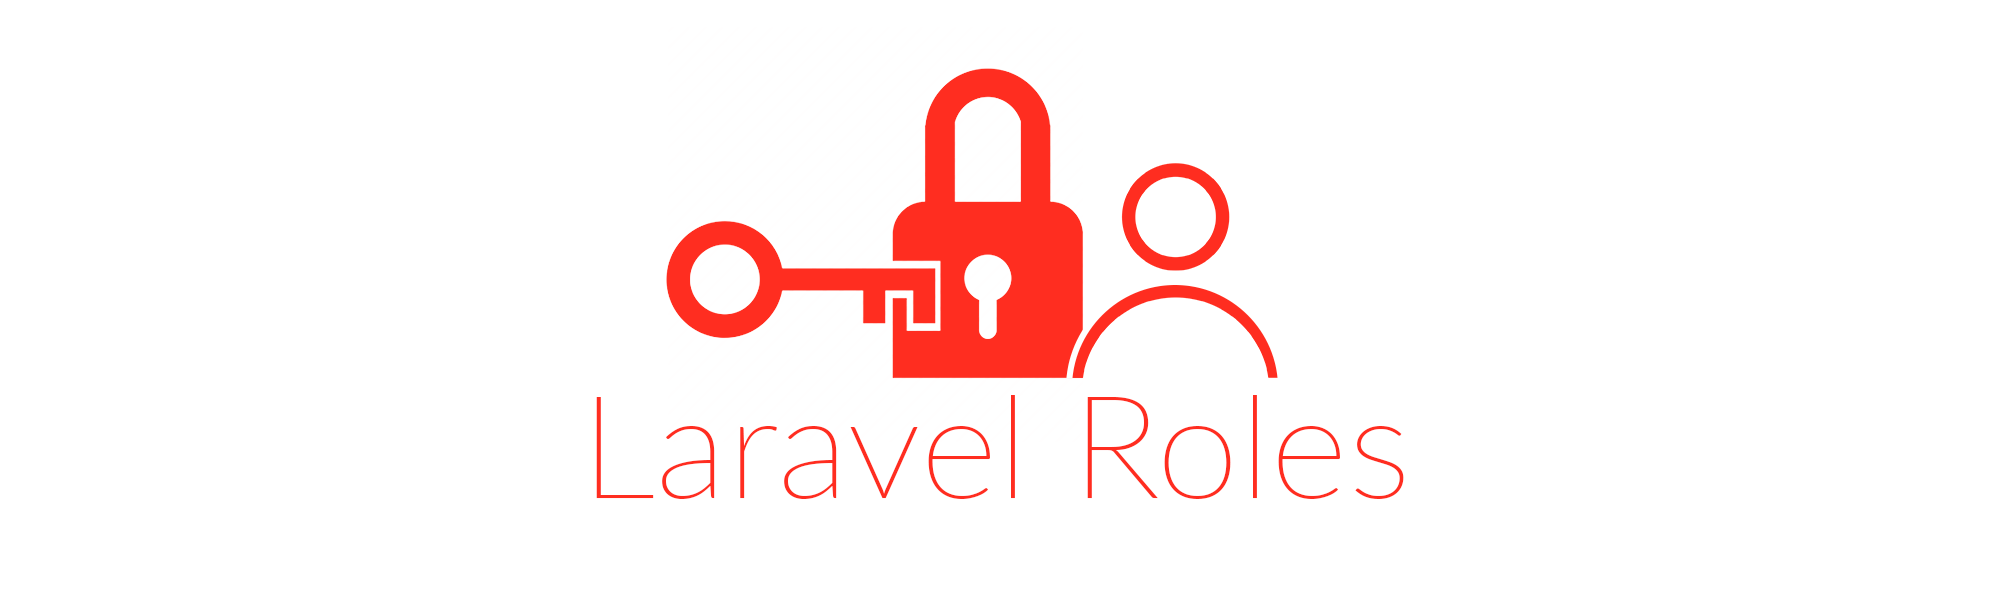 Laravel Roles